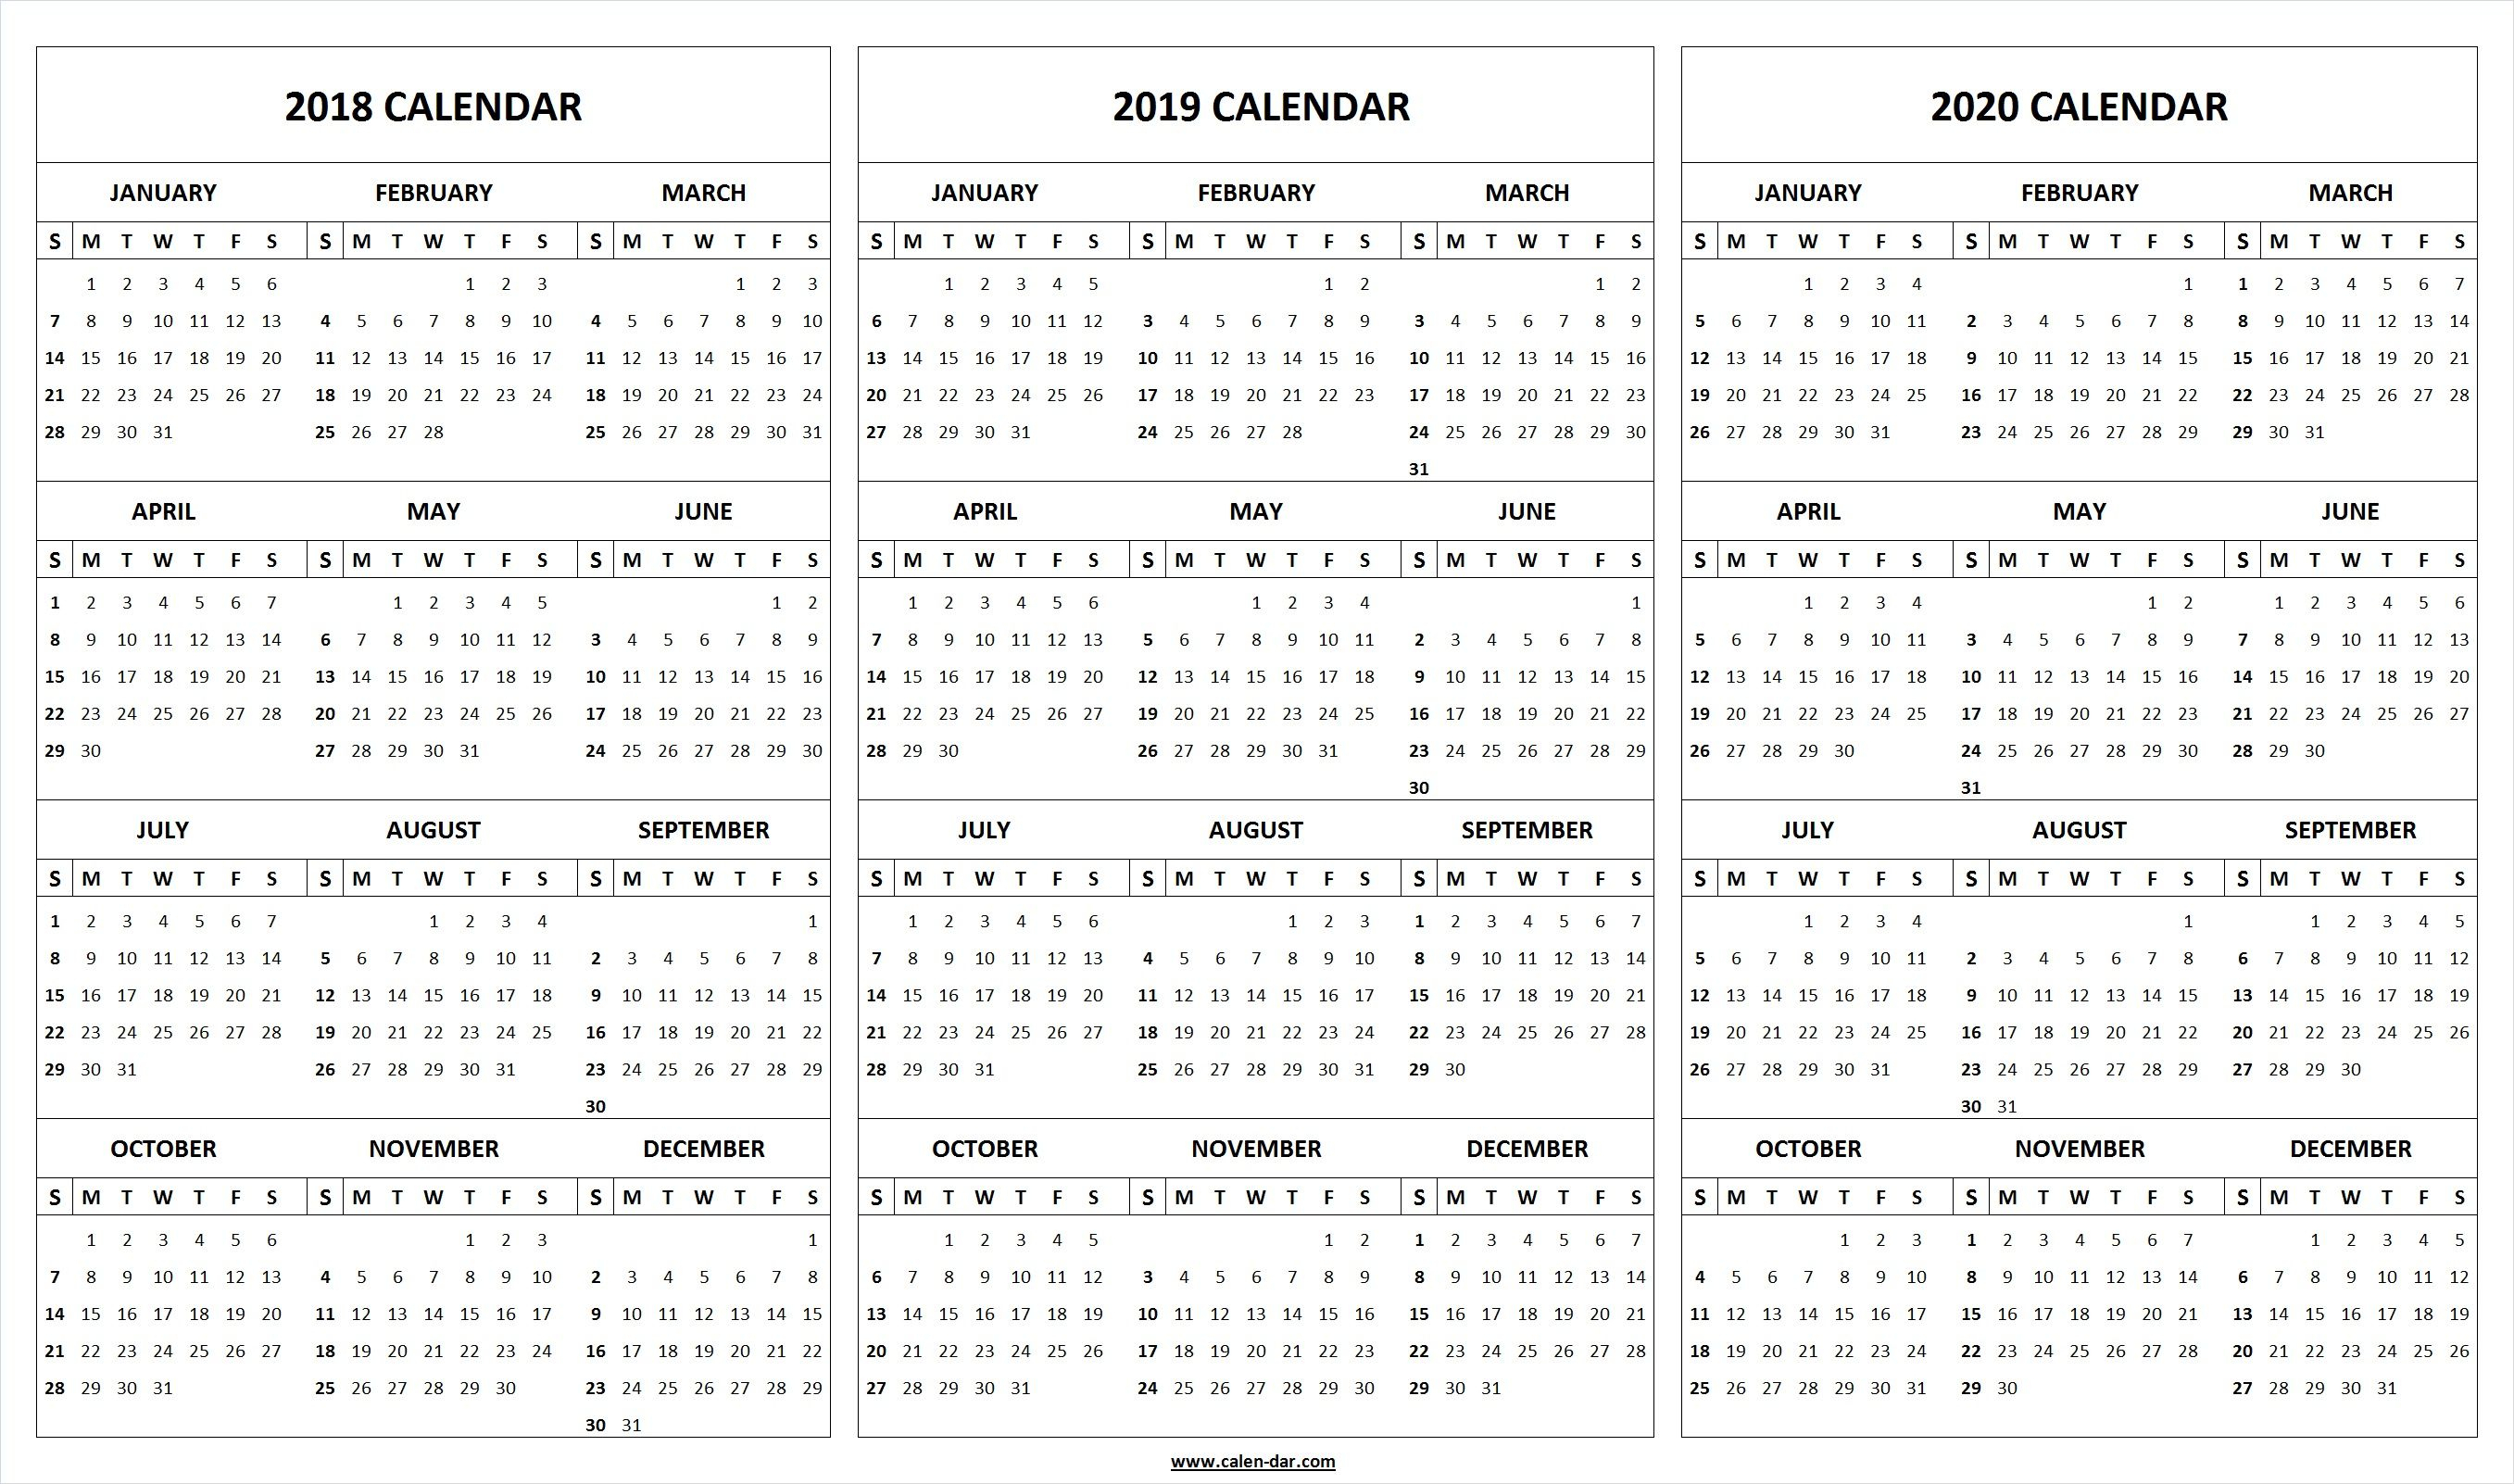 Print Blank 2018 2019 2020 Calendar Template | Organize! | 2021 with Template Academic Calendar With Notes